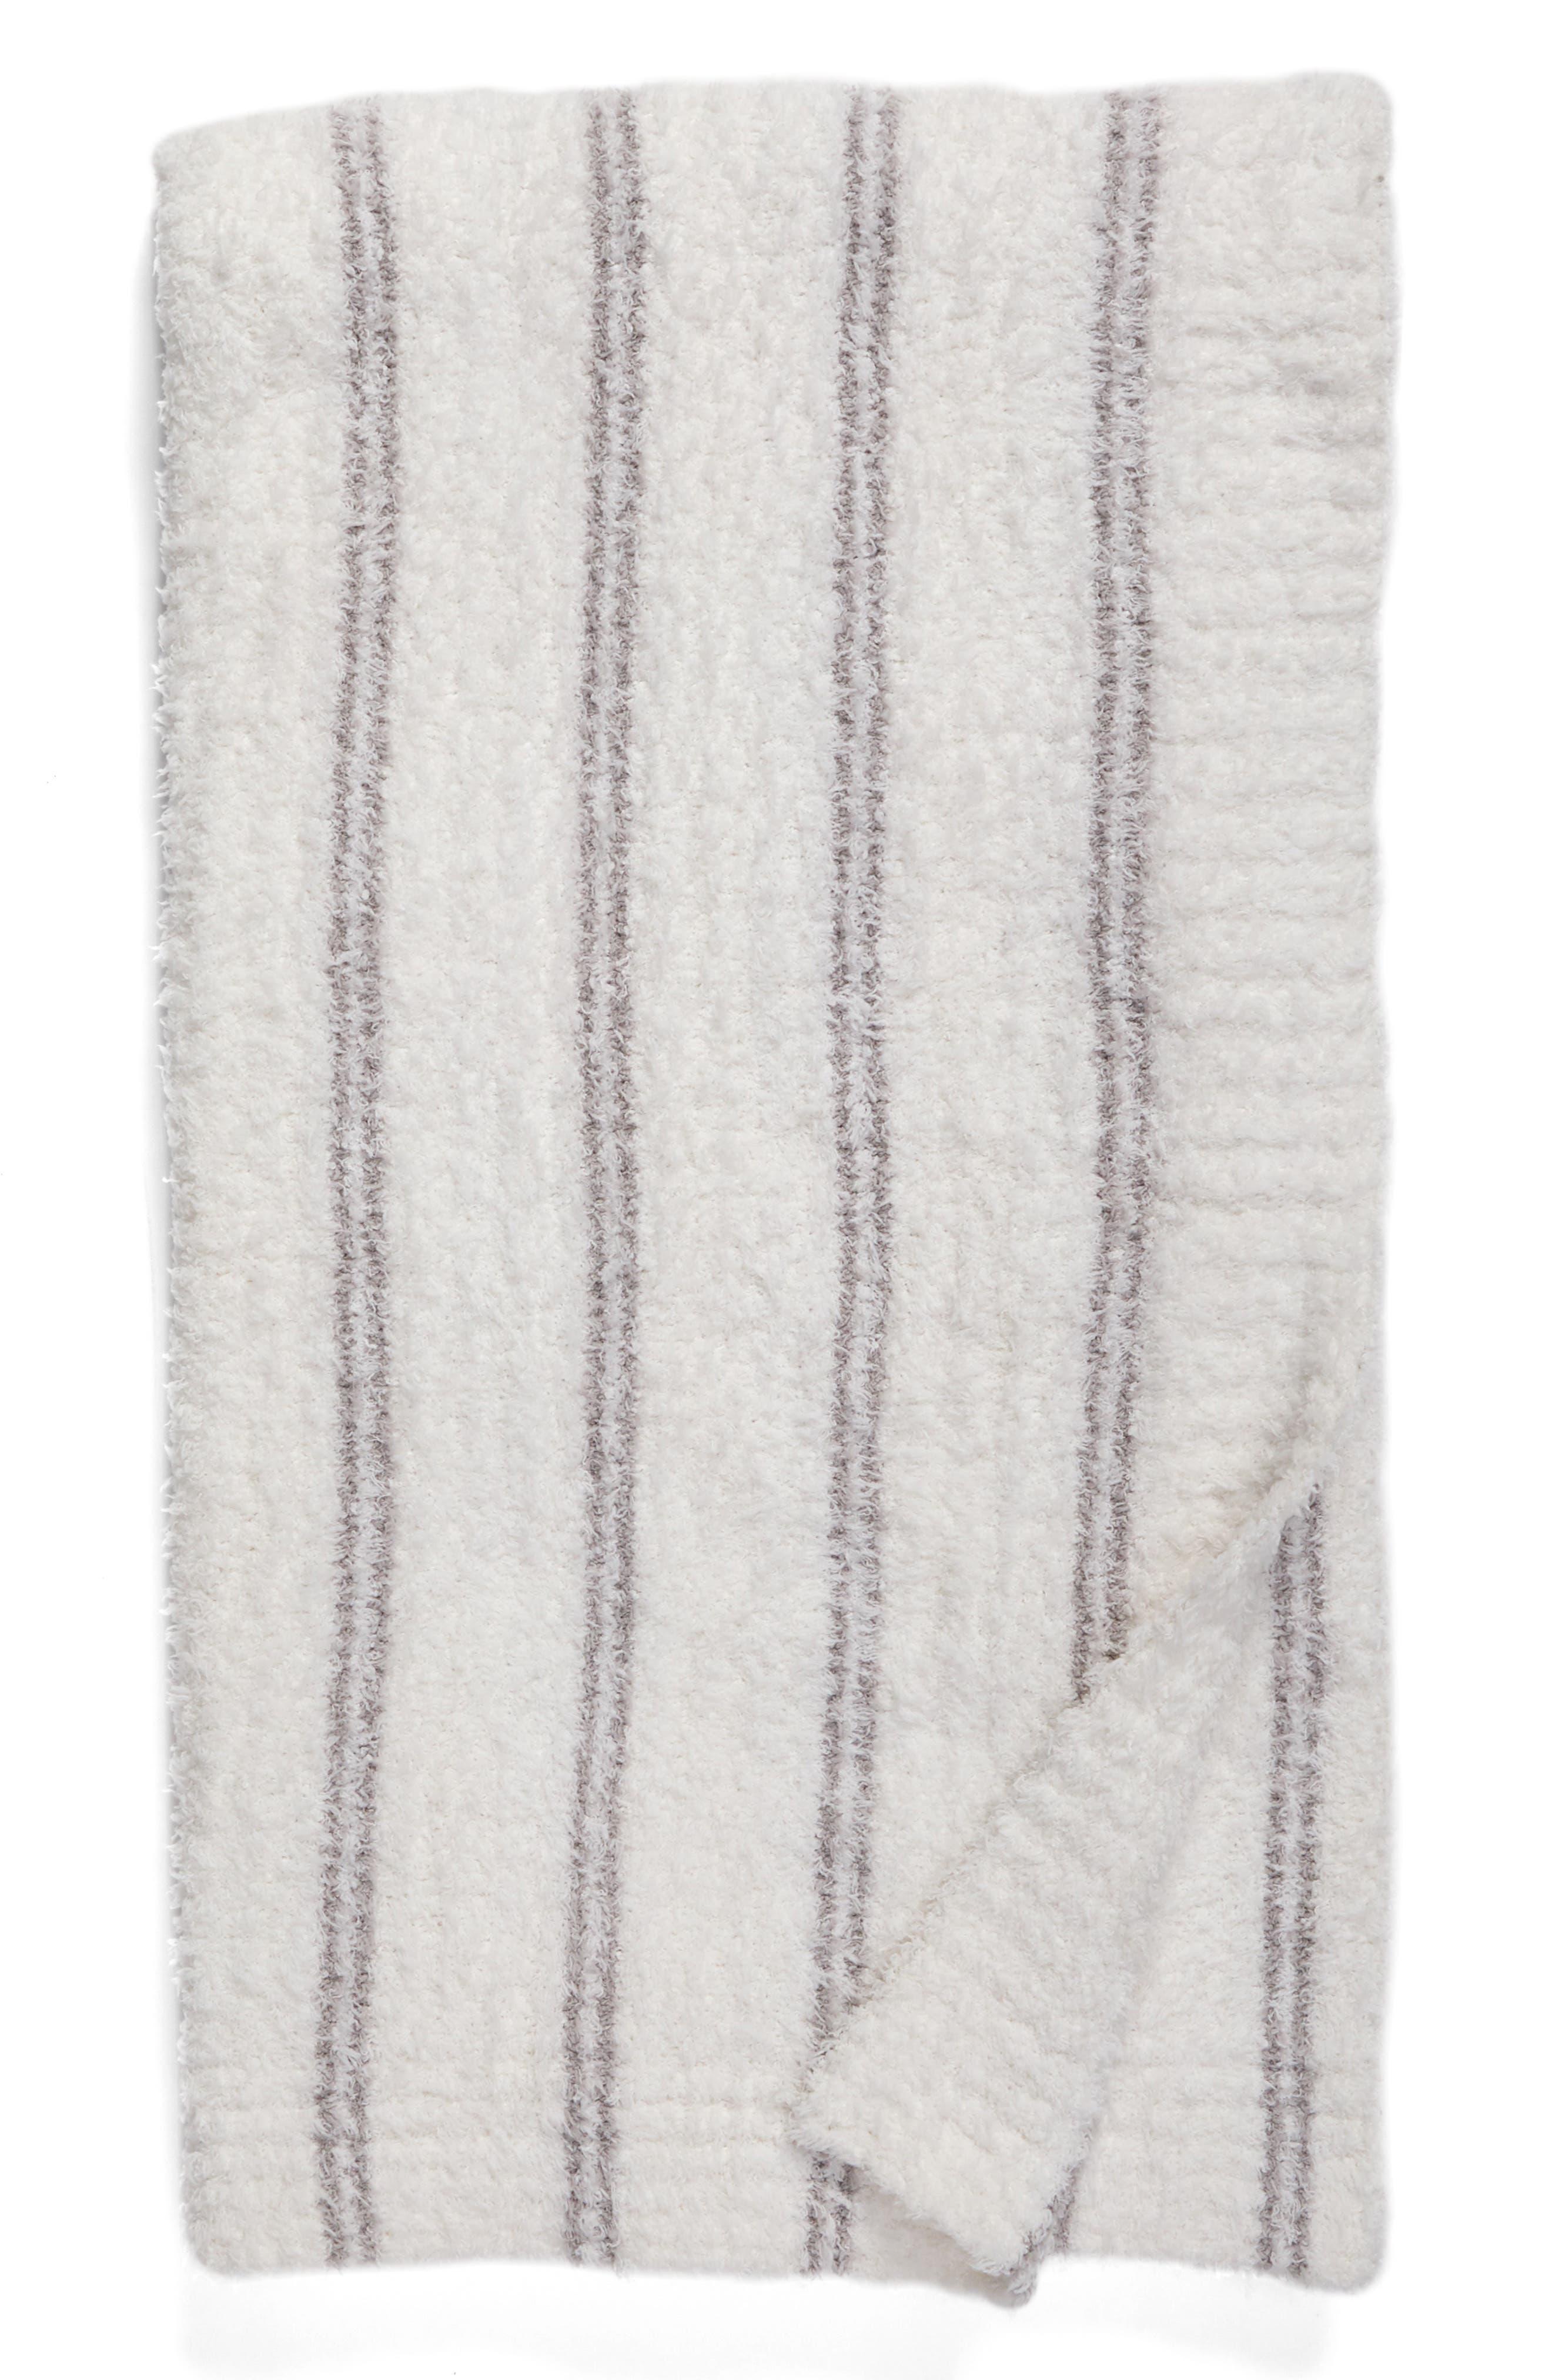 Alternate Image 1 Selected - Barefoot Dreams® Cozychic® Vertical Stripe Throw Blanket